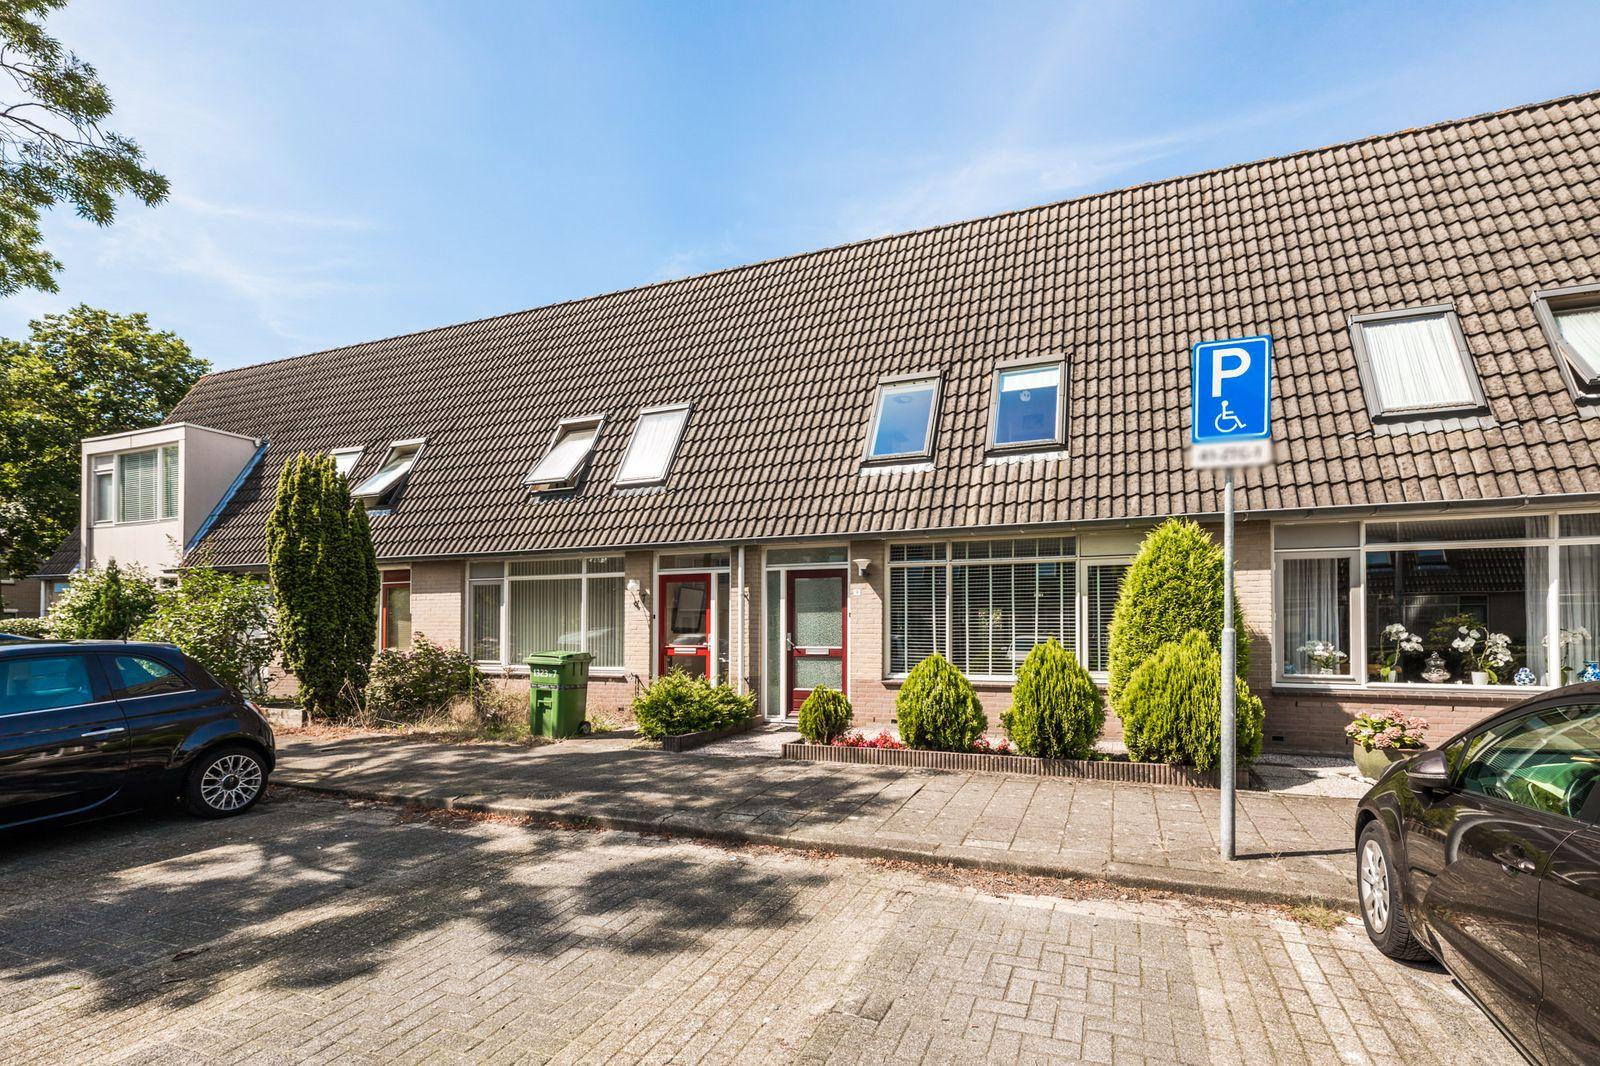 Tartinistraat 9, Almere